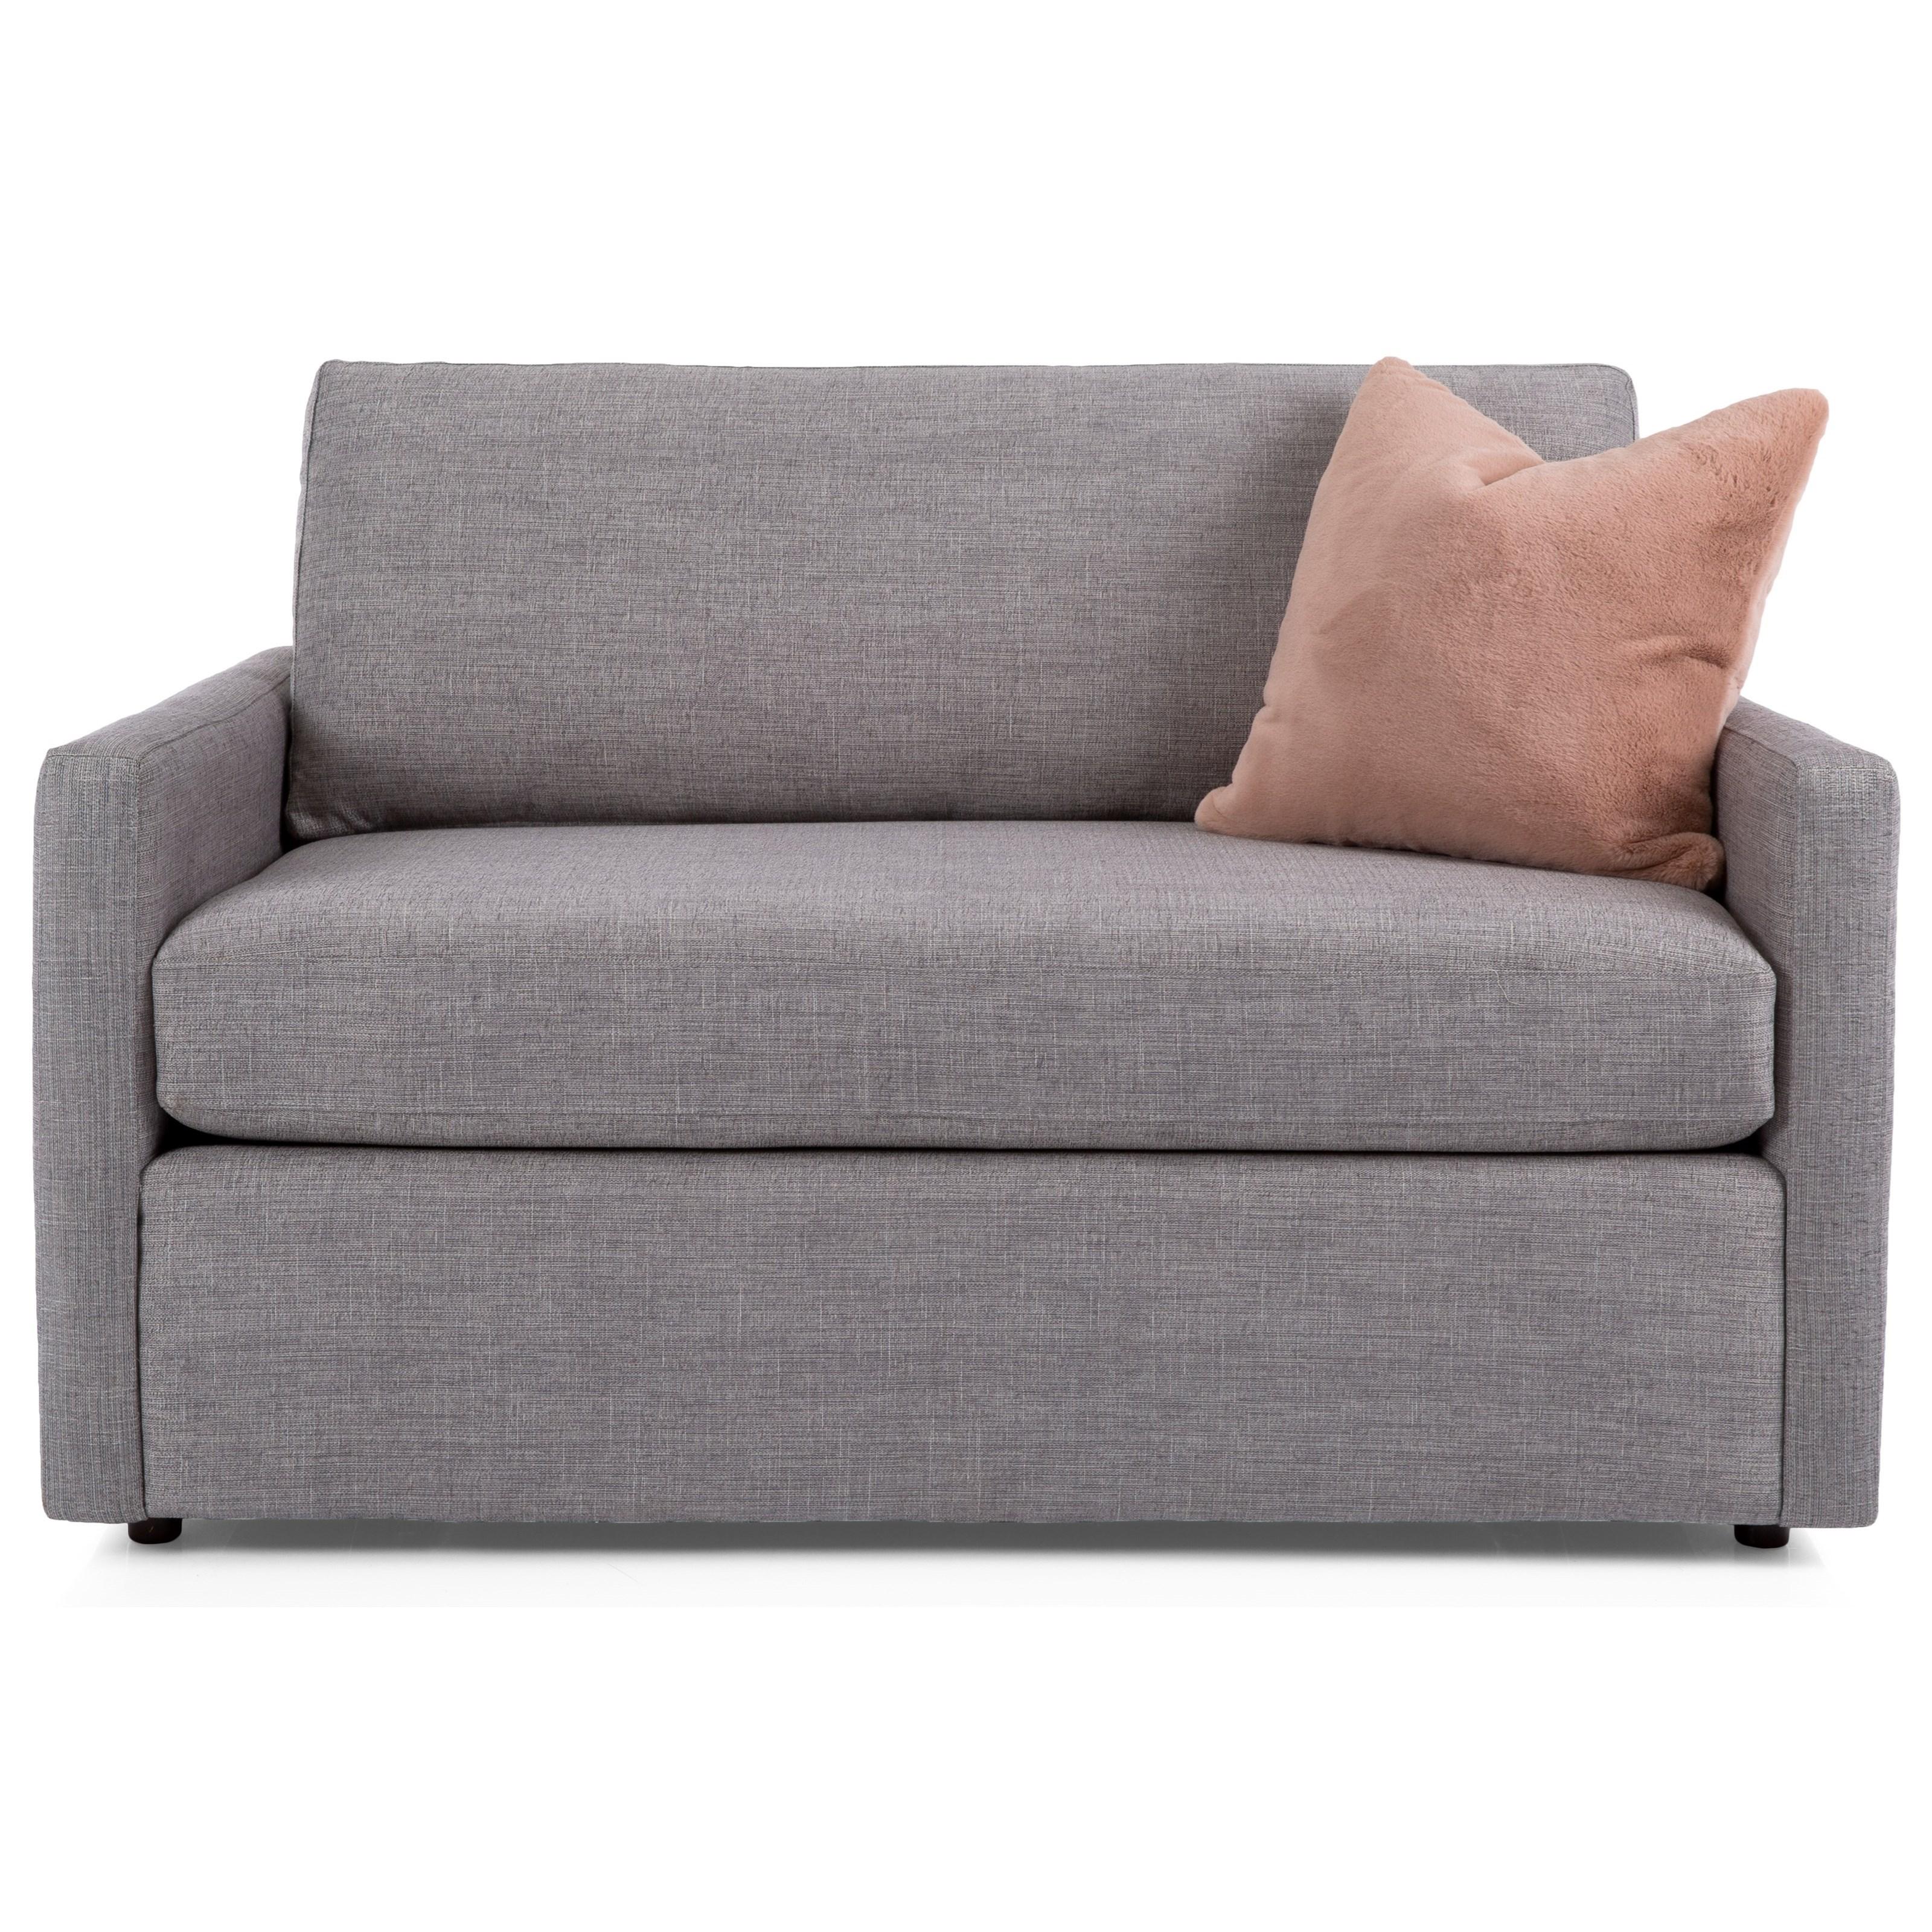 Decor Rest 2068 Contemporary Loveseat Twin Sleeper Stoney Creek Furniture Sleeper Sofas